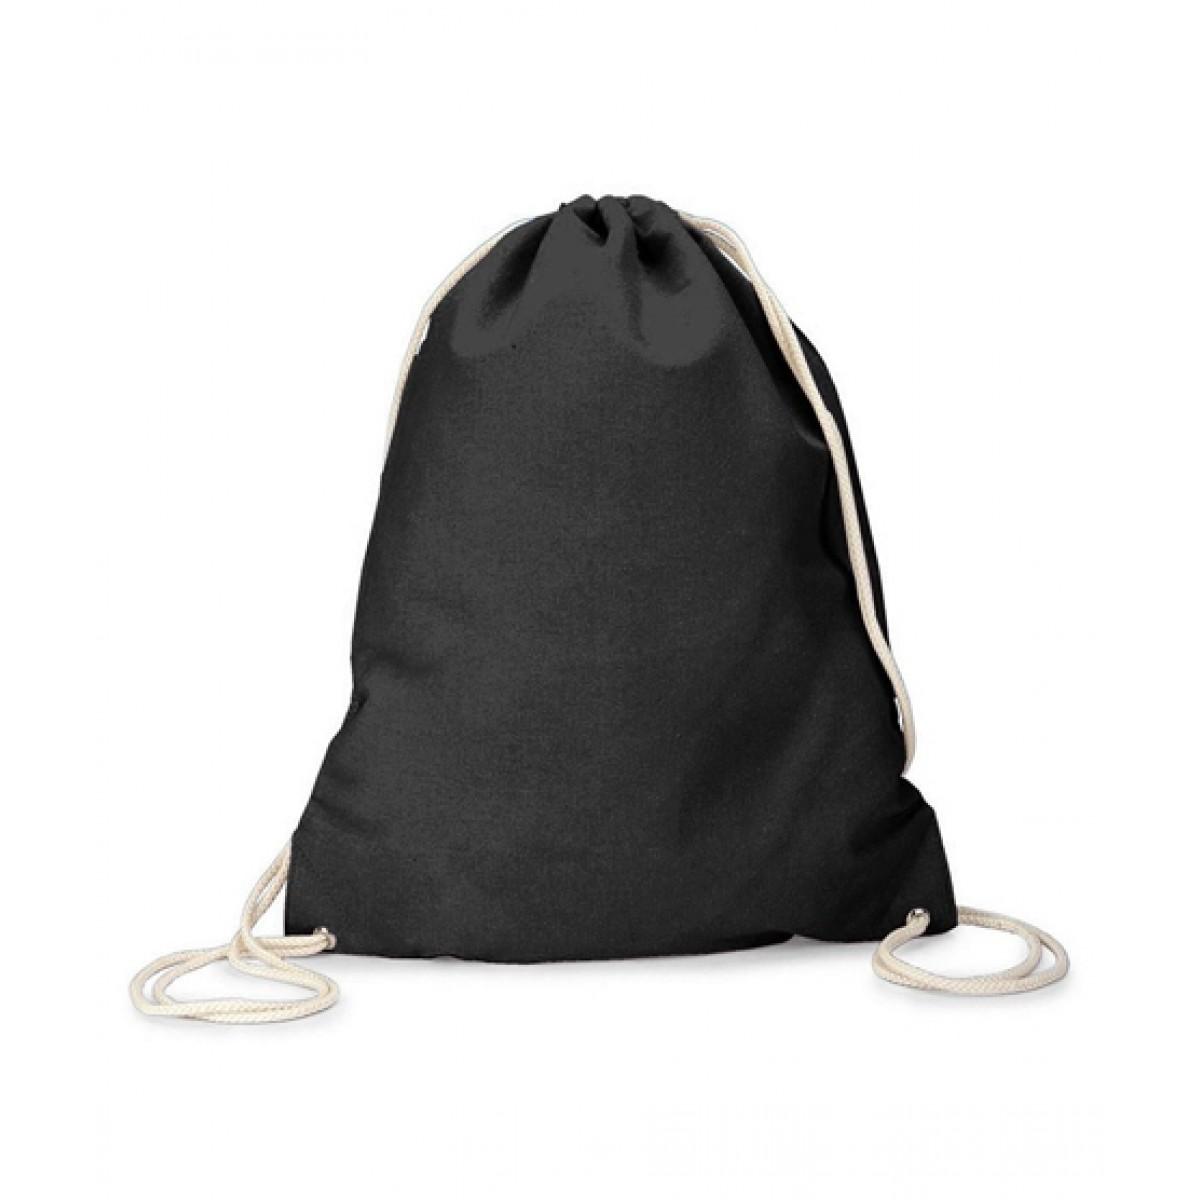 Feeha Store Fashionable Casual Bag Black